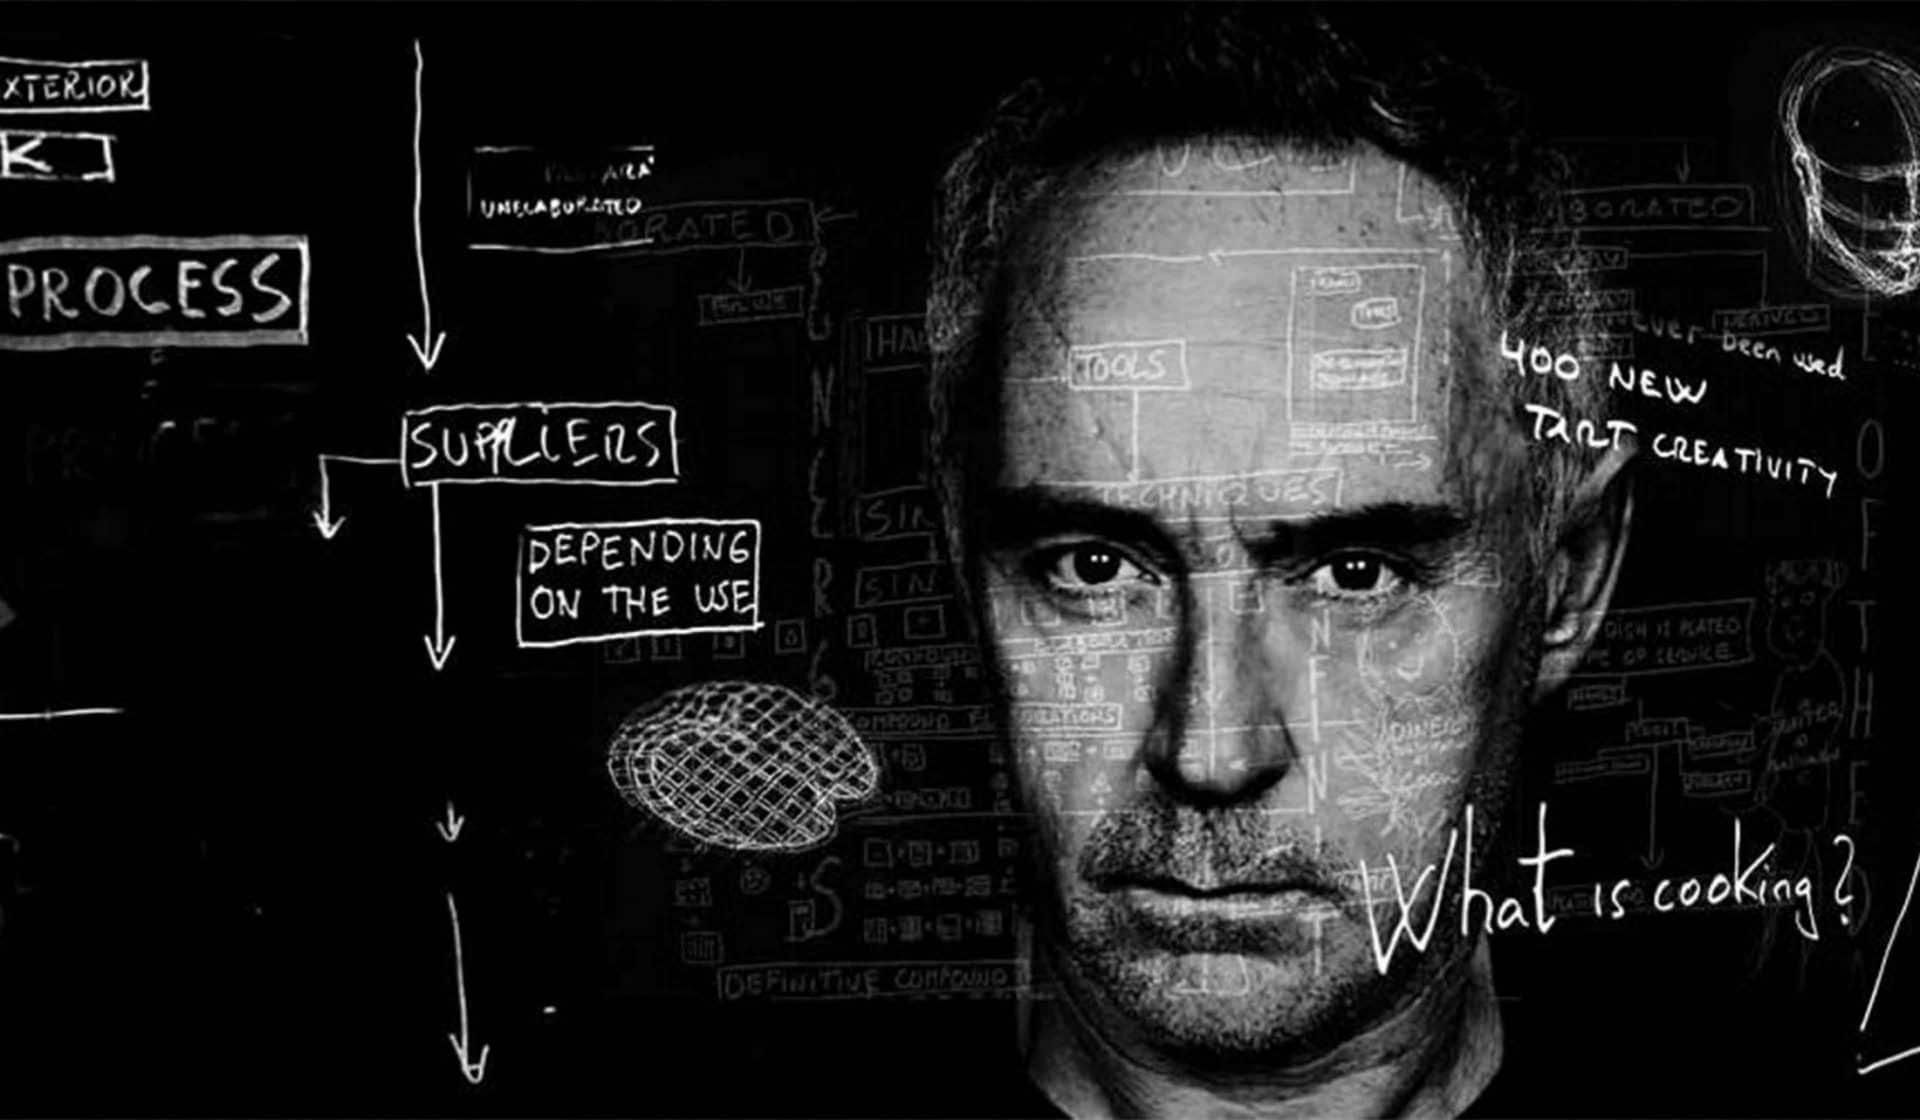 Ferran Adriàék 7 (+sok) év munkája nyer értelmet: El Bulli 1846 - Dining Guide